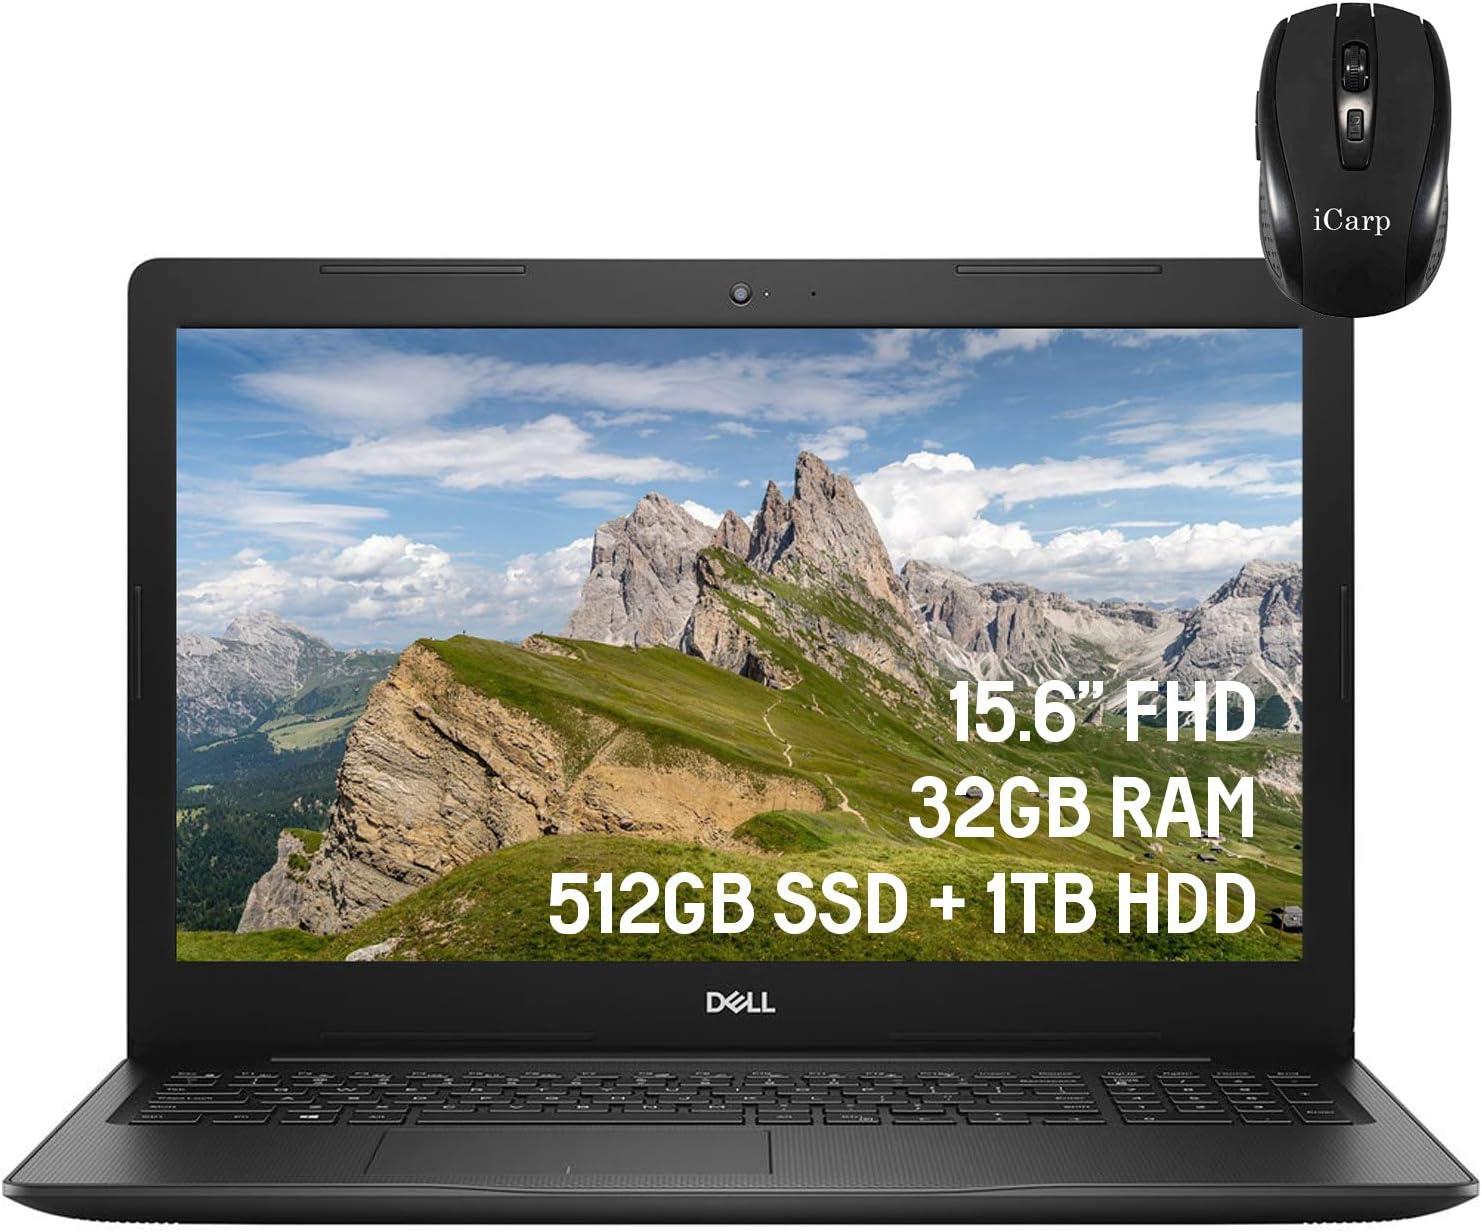 2020 Latest Dell Vostro 15 3590 Business Laptop, 15.6